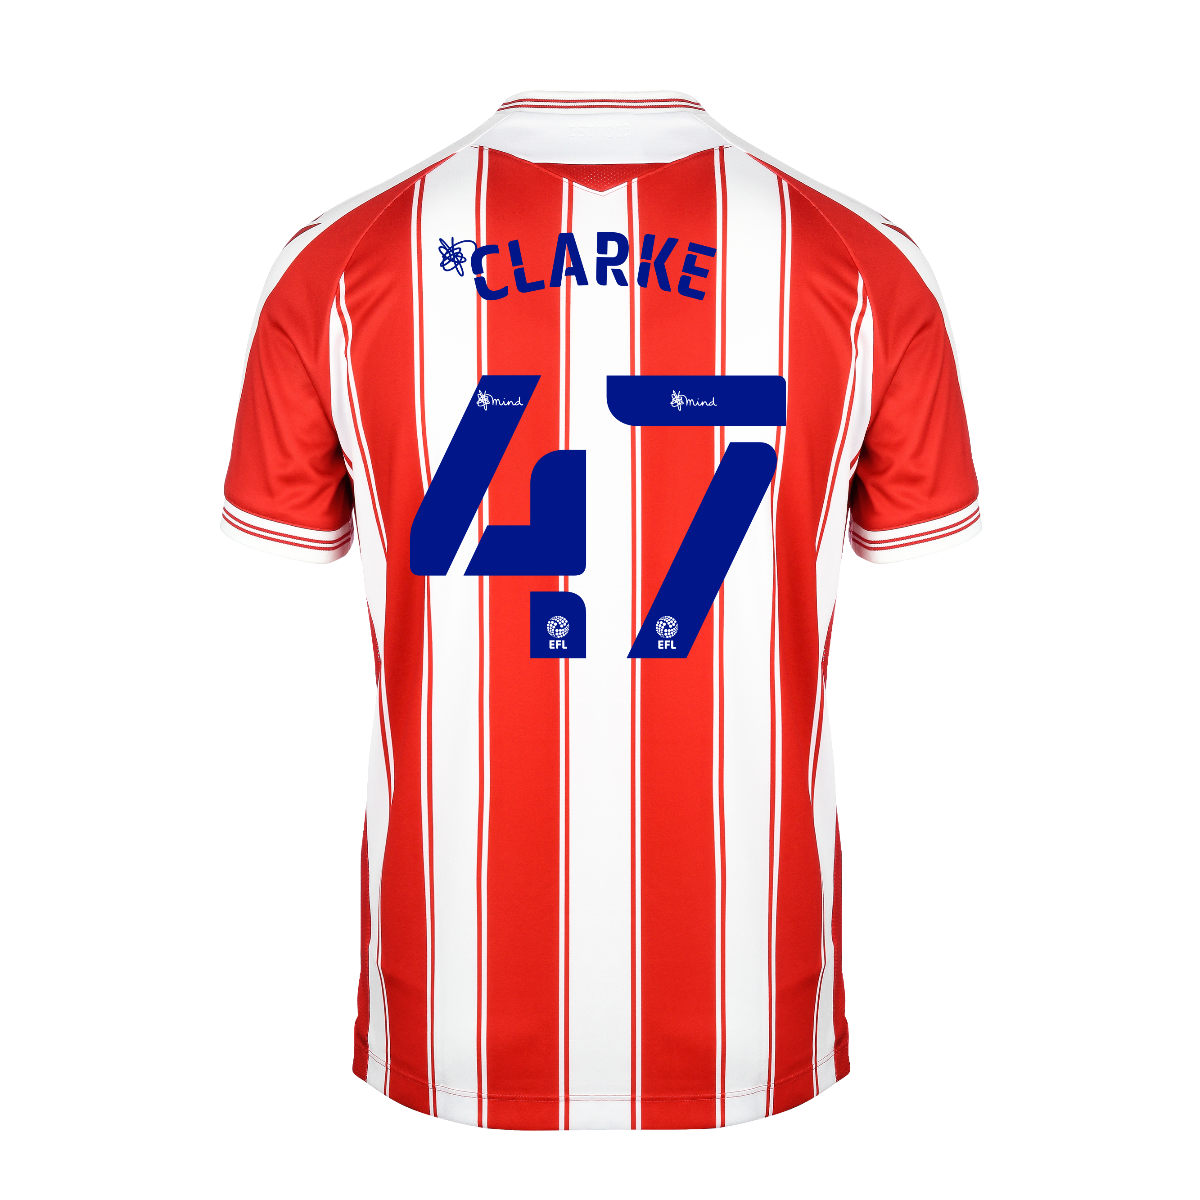 2020/21 Ladies Fit Home Shirt - Clarke